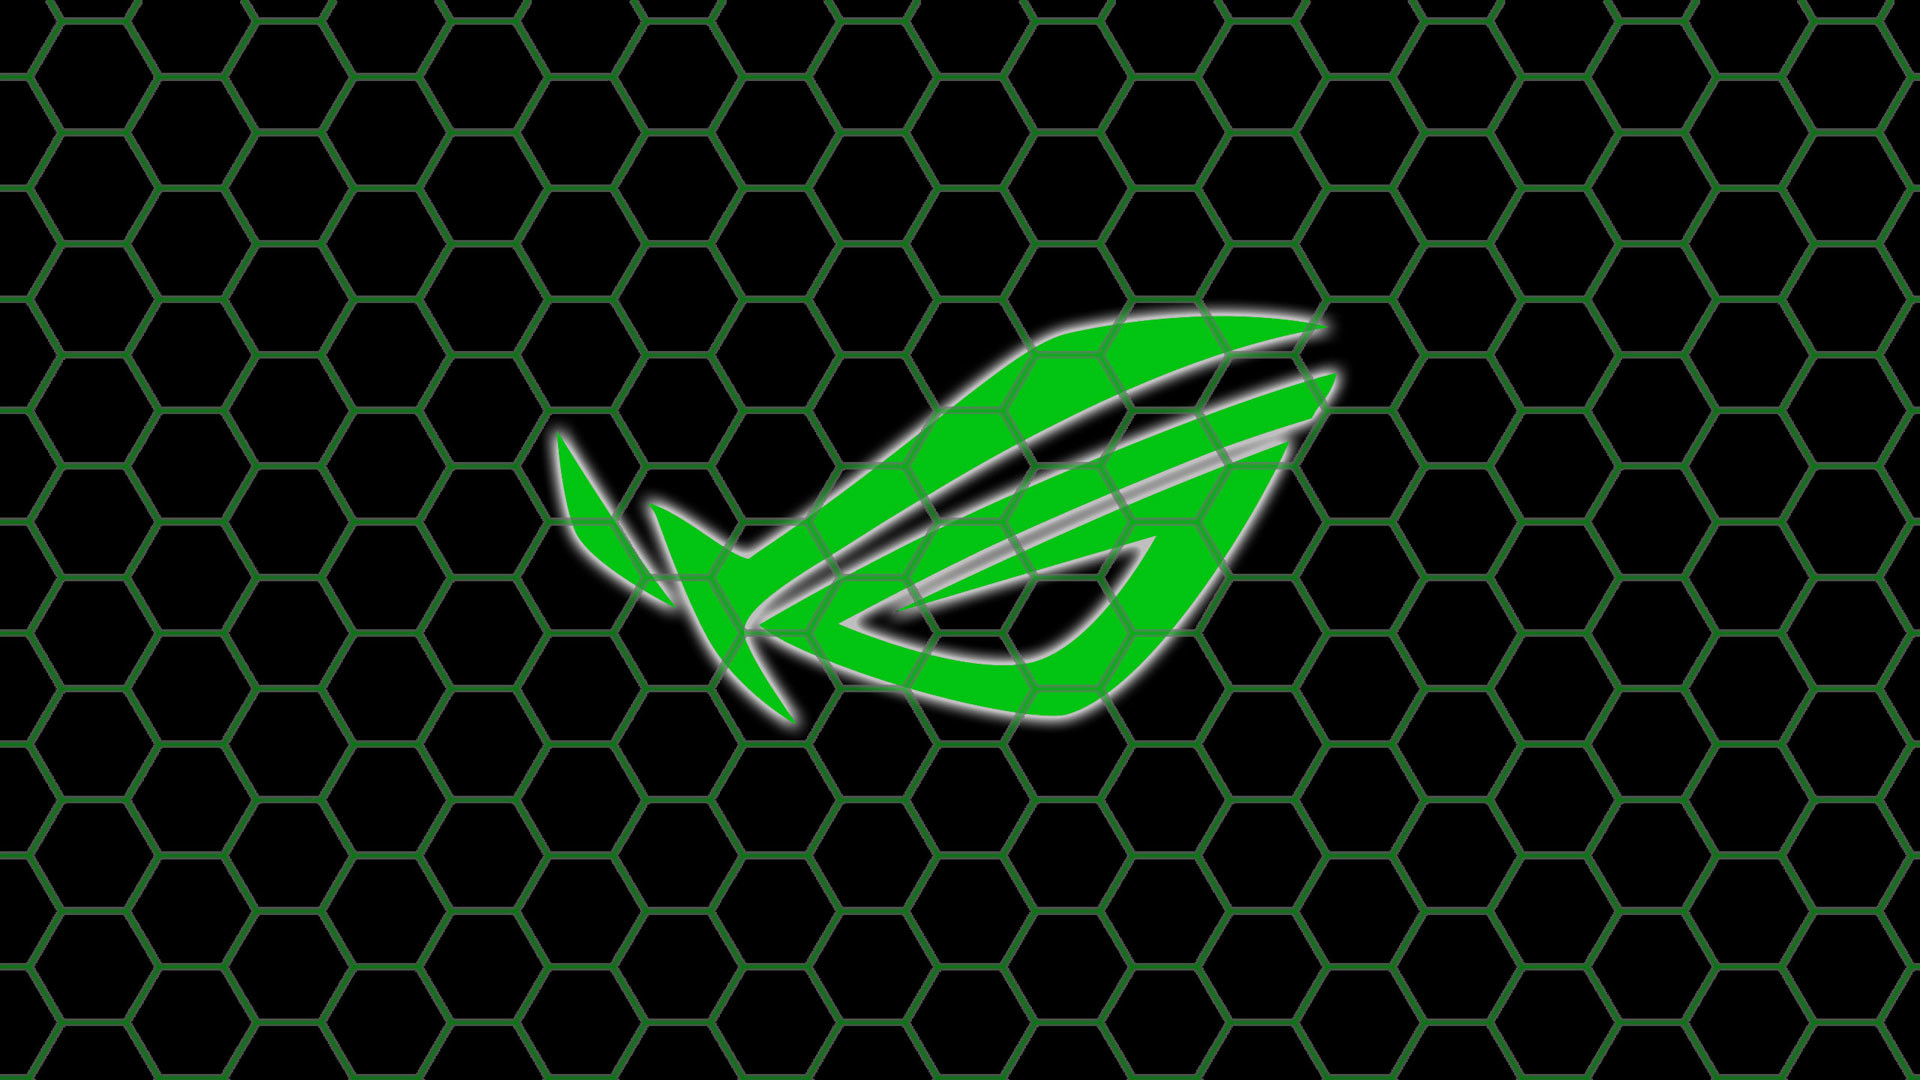 Asus Green Wallpaper: Asus Desktop Background (75+ Pictures